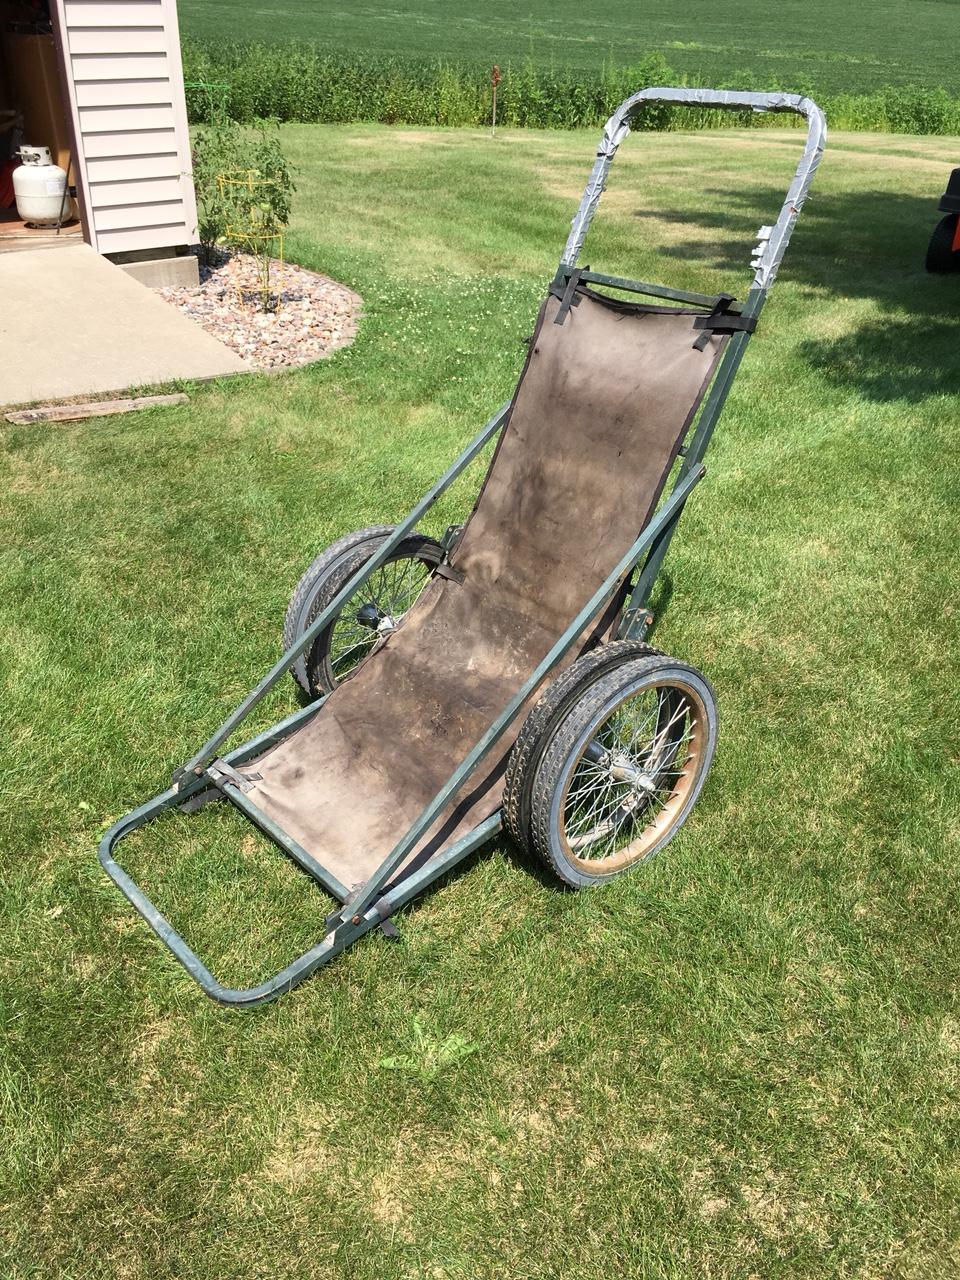 Cabela's Game Cart | Iowawhitetail forums